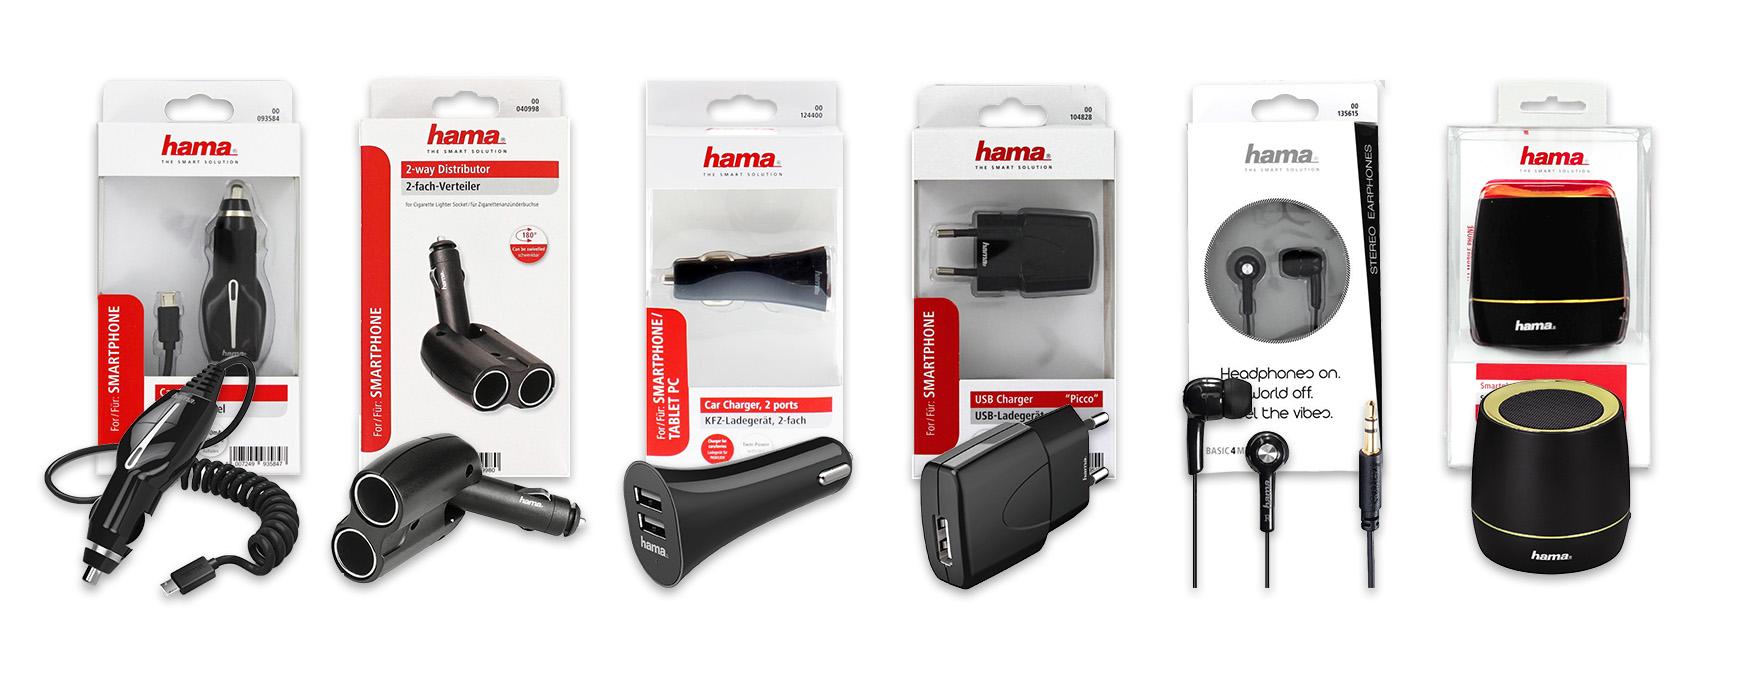 Hama_Produkte_150dpi